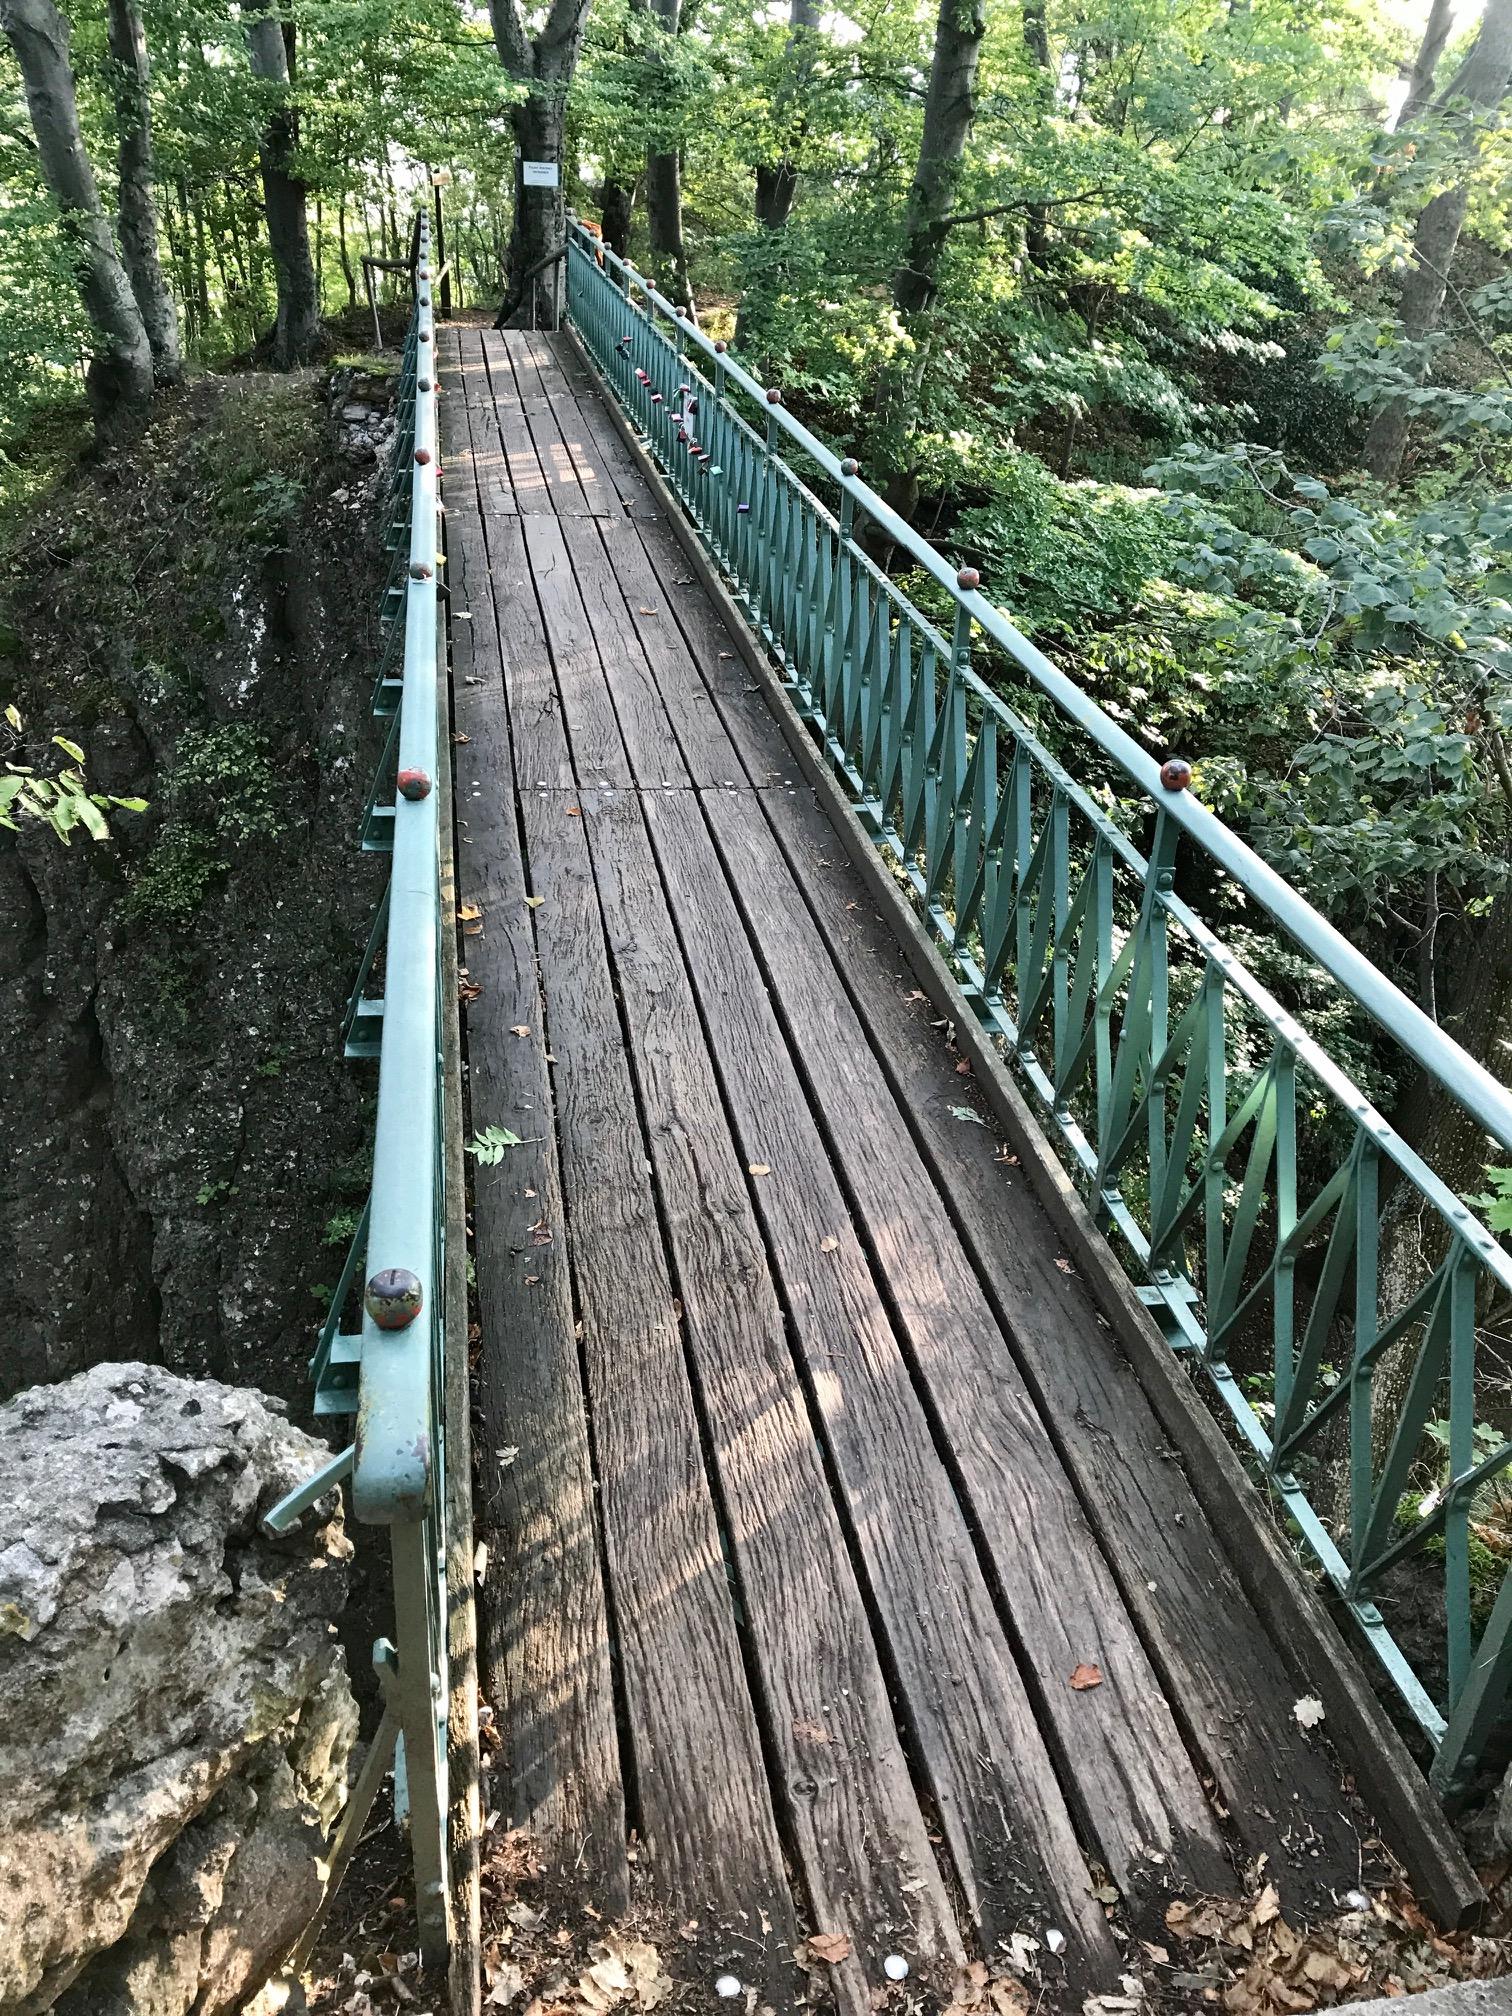 Brücke an der Ruine Rosenstein in Heubac, Albsteig, Etappe 4